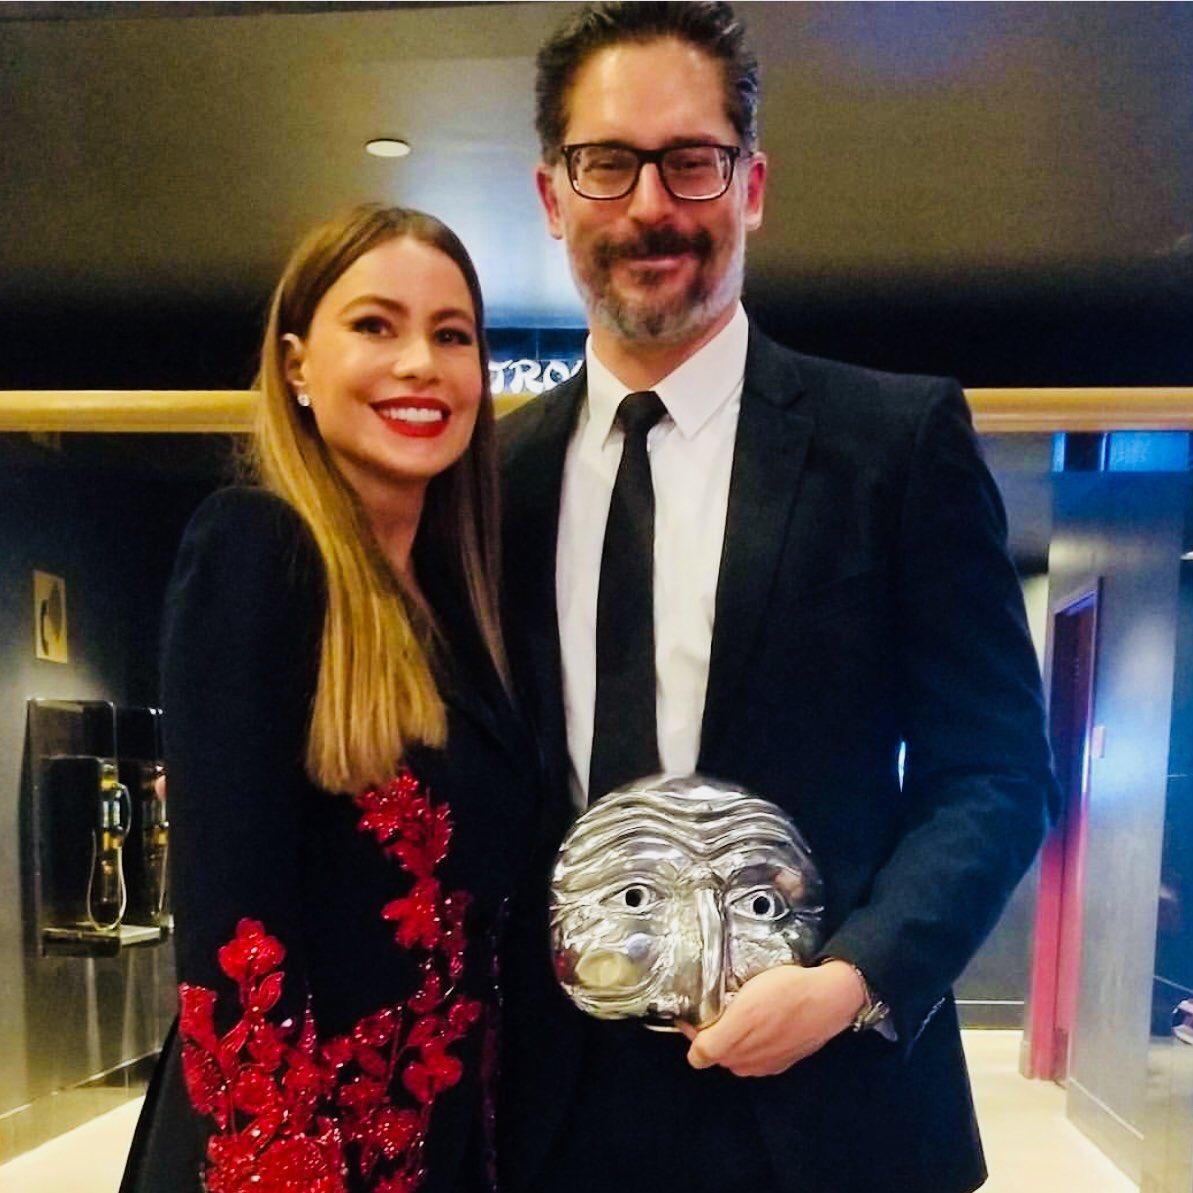 RT @JoeManganiello: Grazie Los Angeles Italia Film Festival! https://t.co/oxjfb45d3O